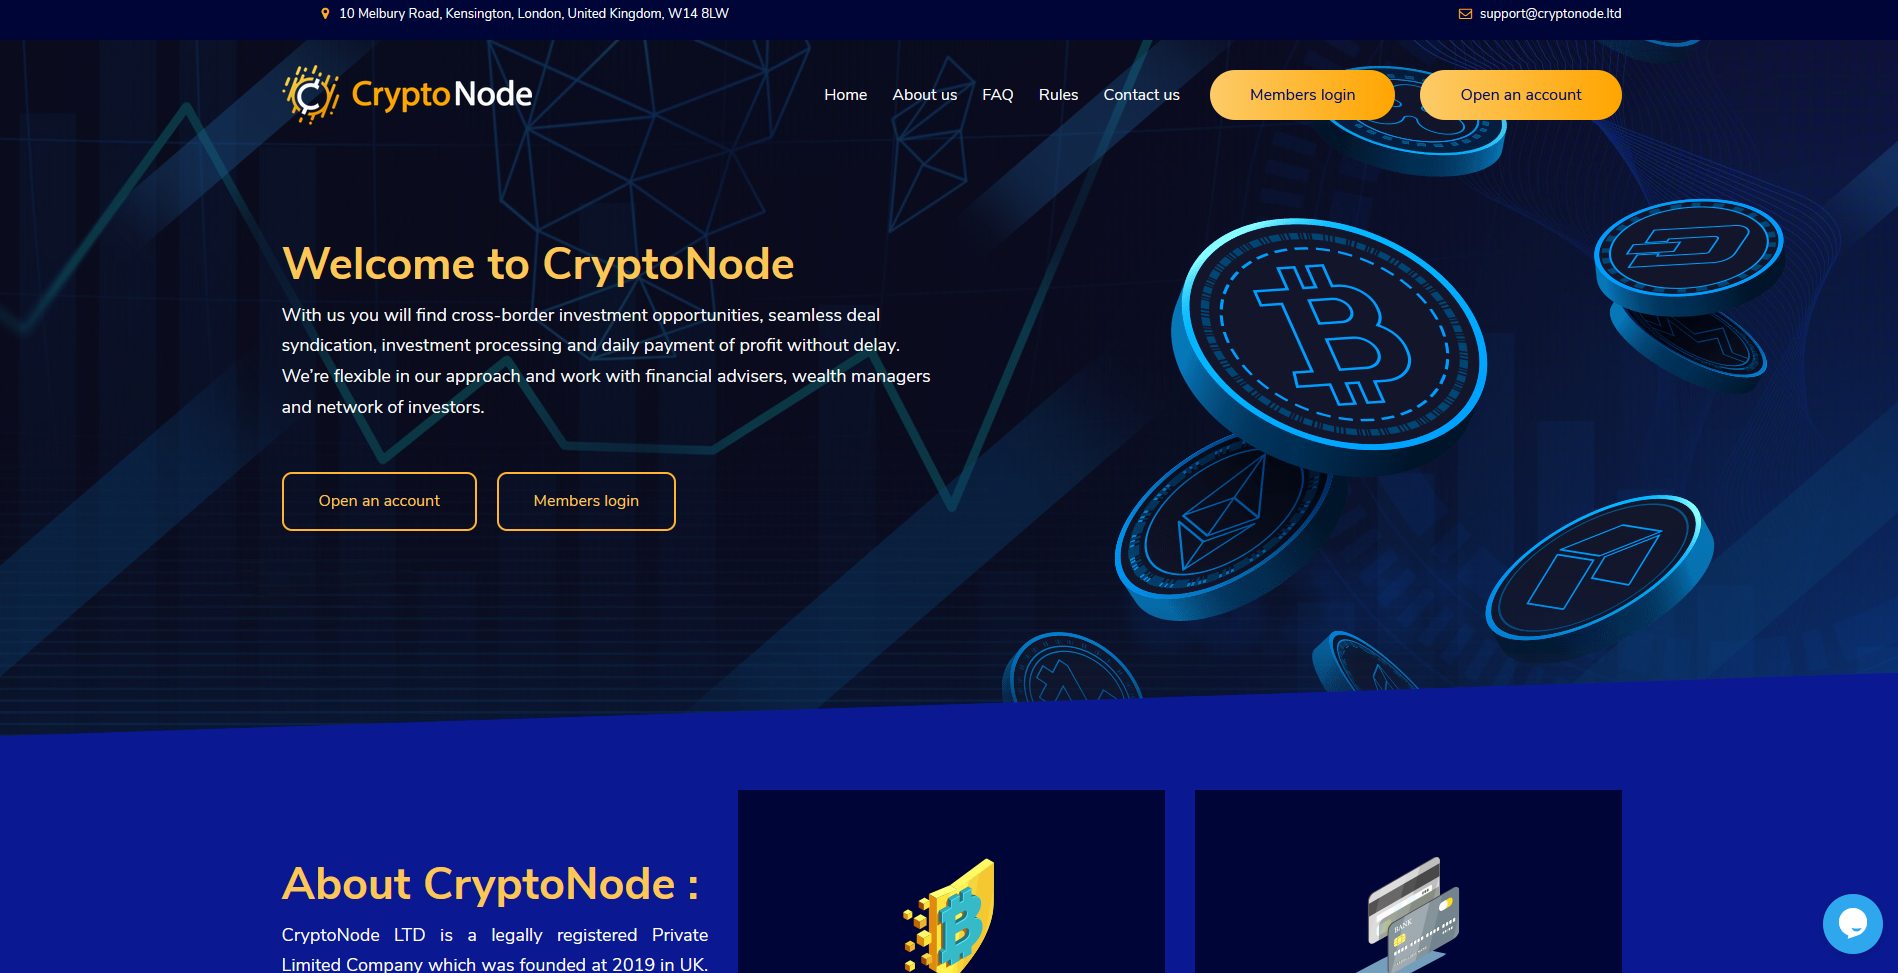 CryptoNode - cryptonode.ltd